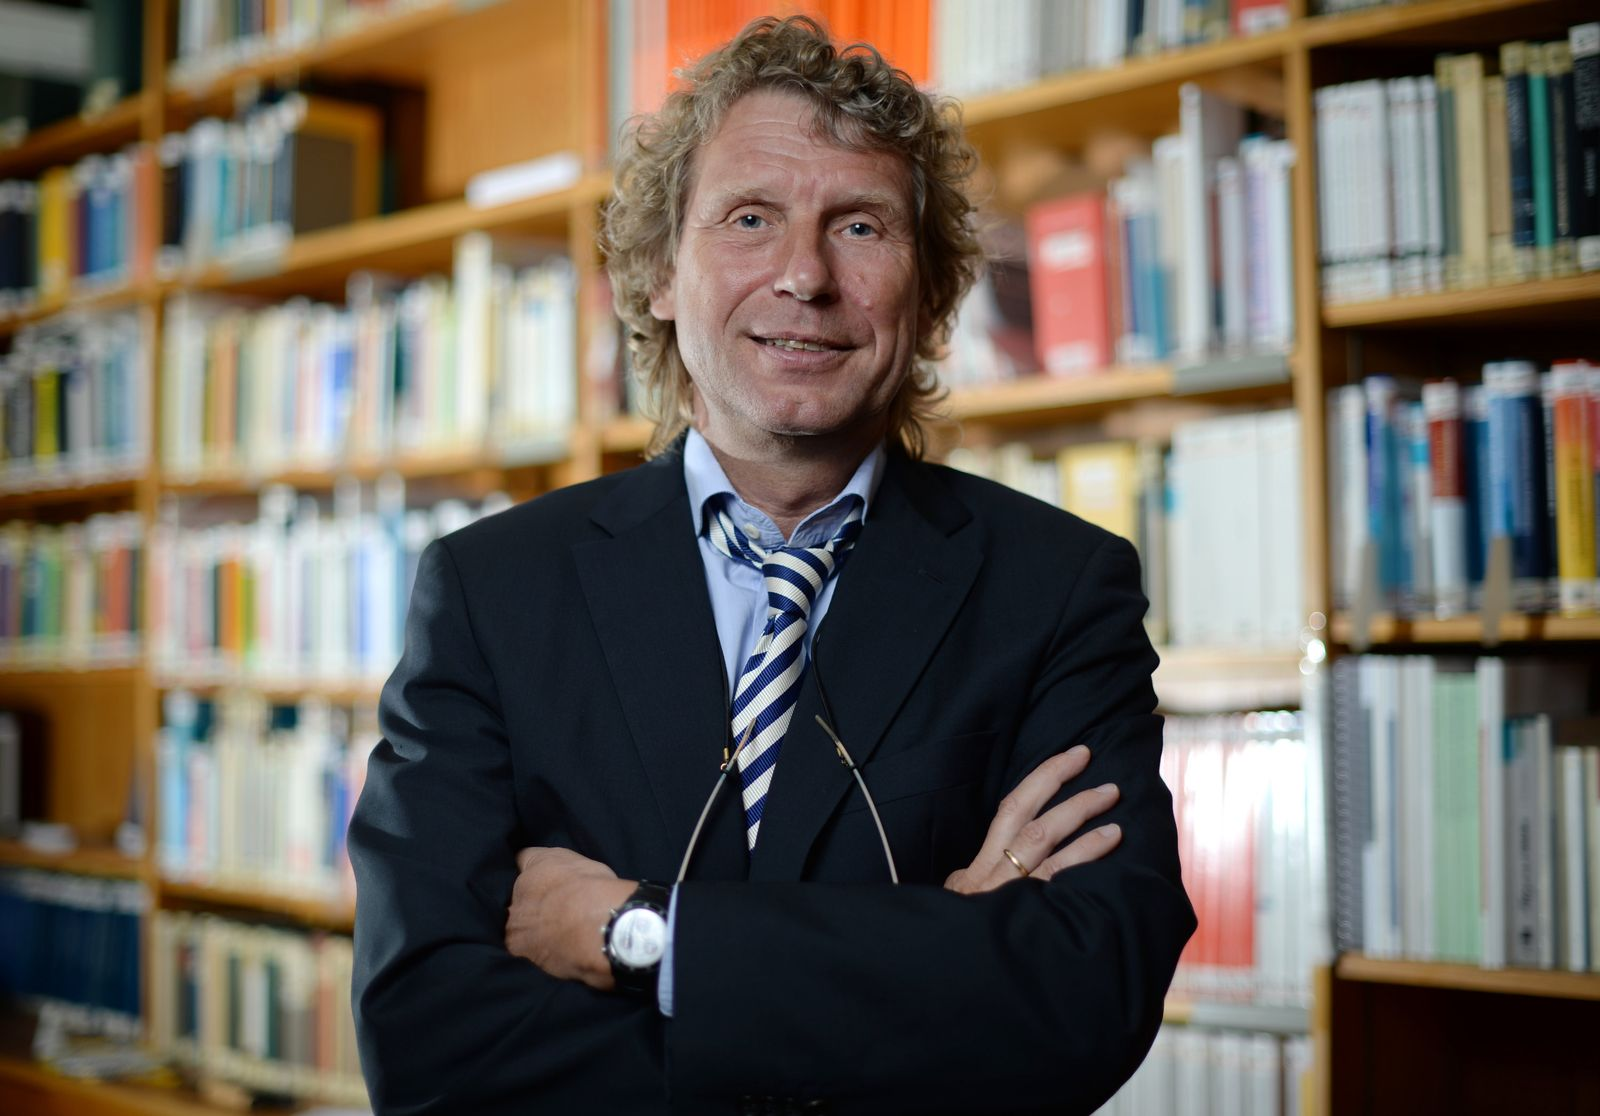 Freiburger Finanzwissenschaftler Bernd Raffelhüschen